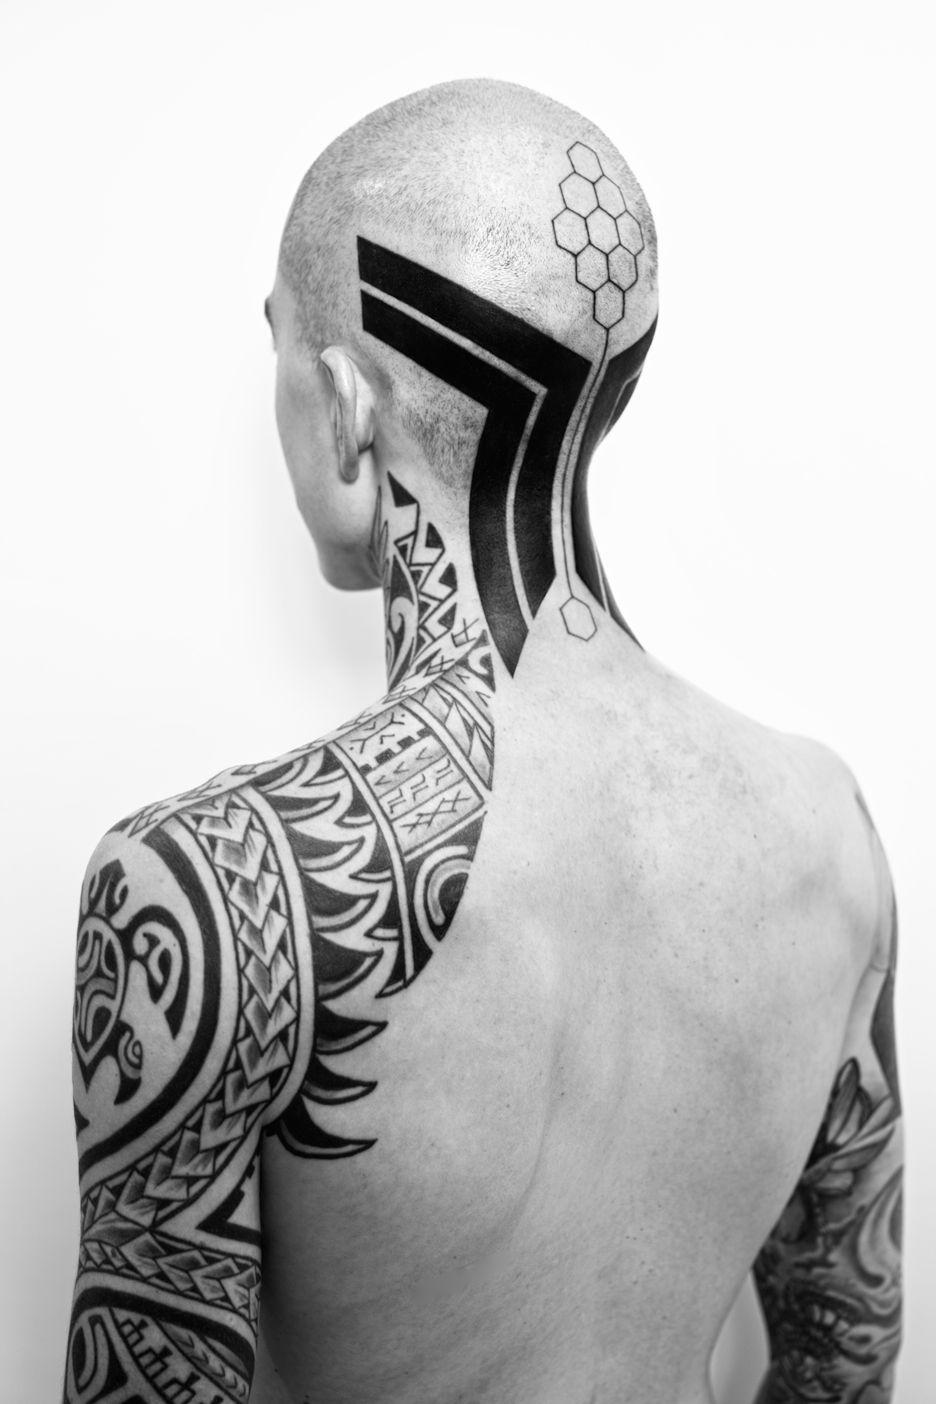 2spirit Tattoo Polynesian Tattoos Pinterest Electronic Circuit Board Full Sleeve Blackwork Male